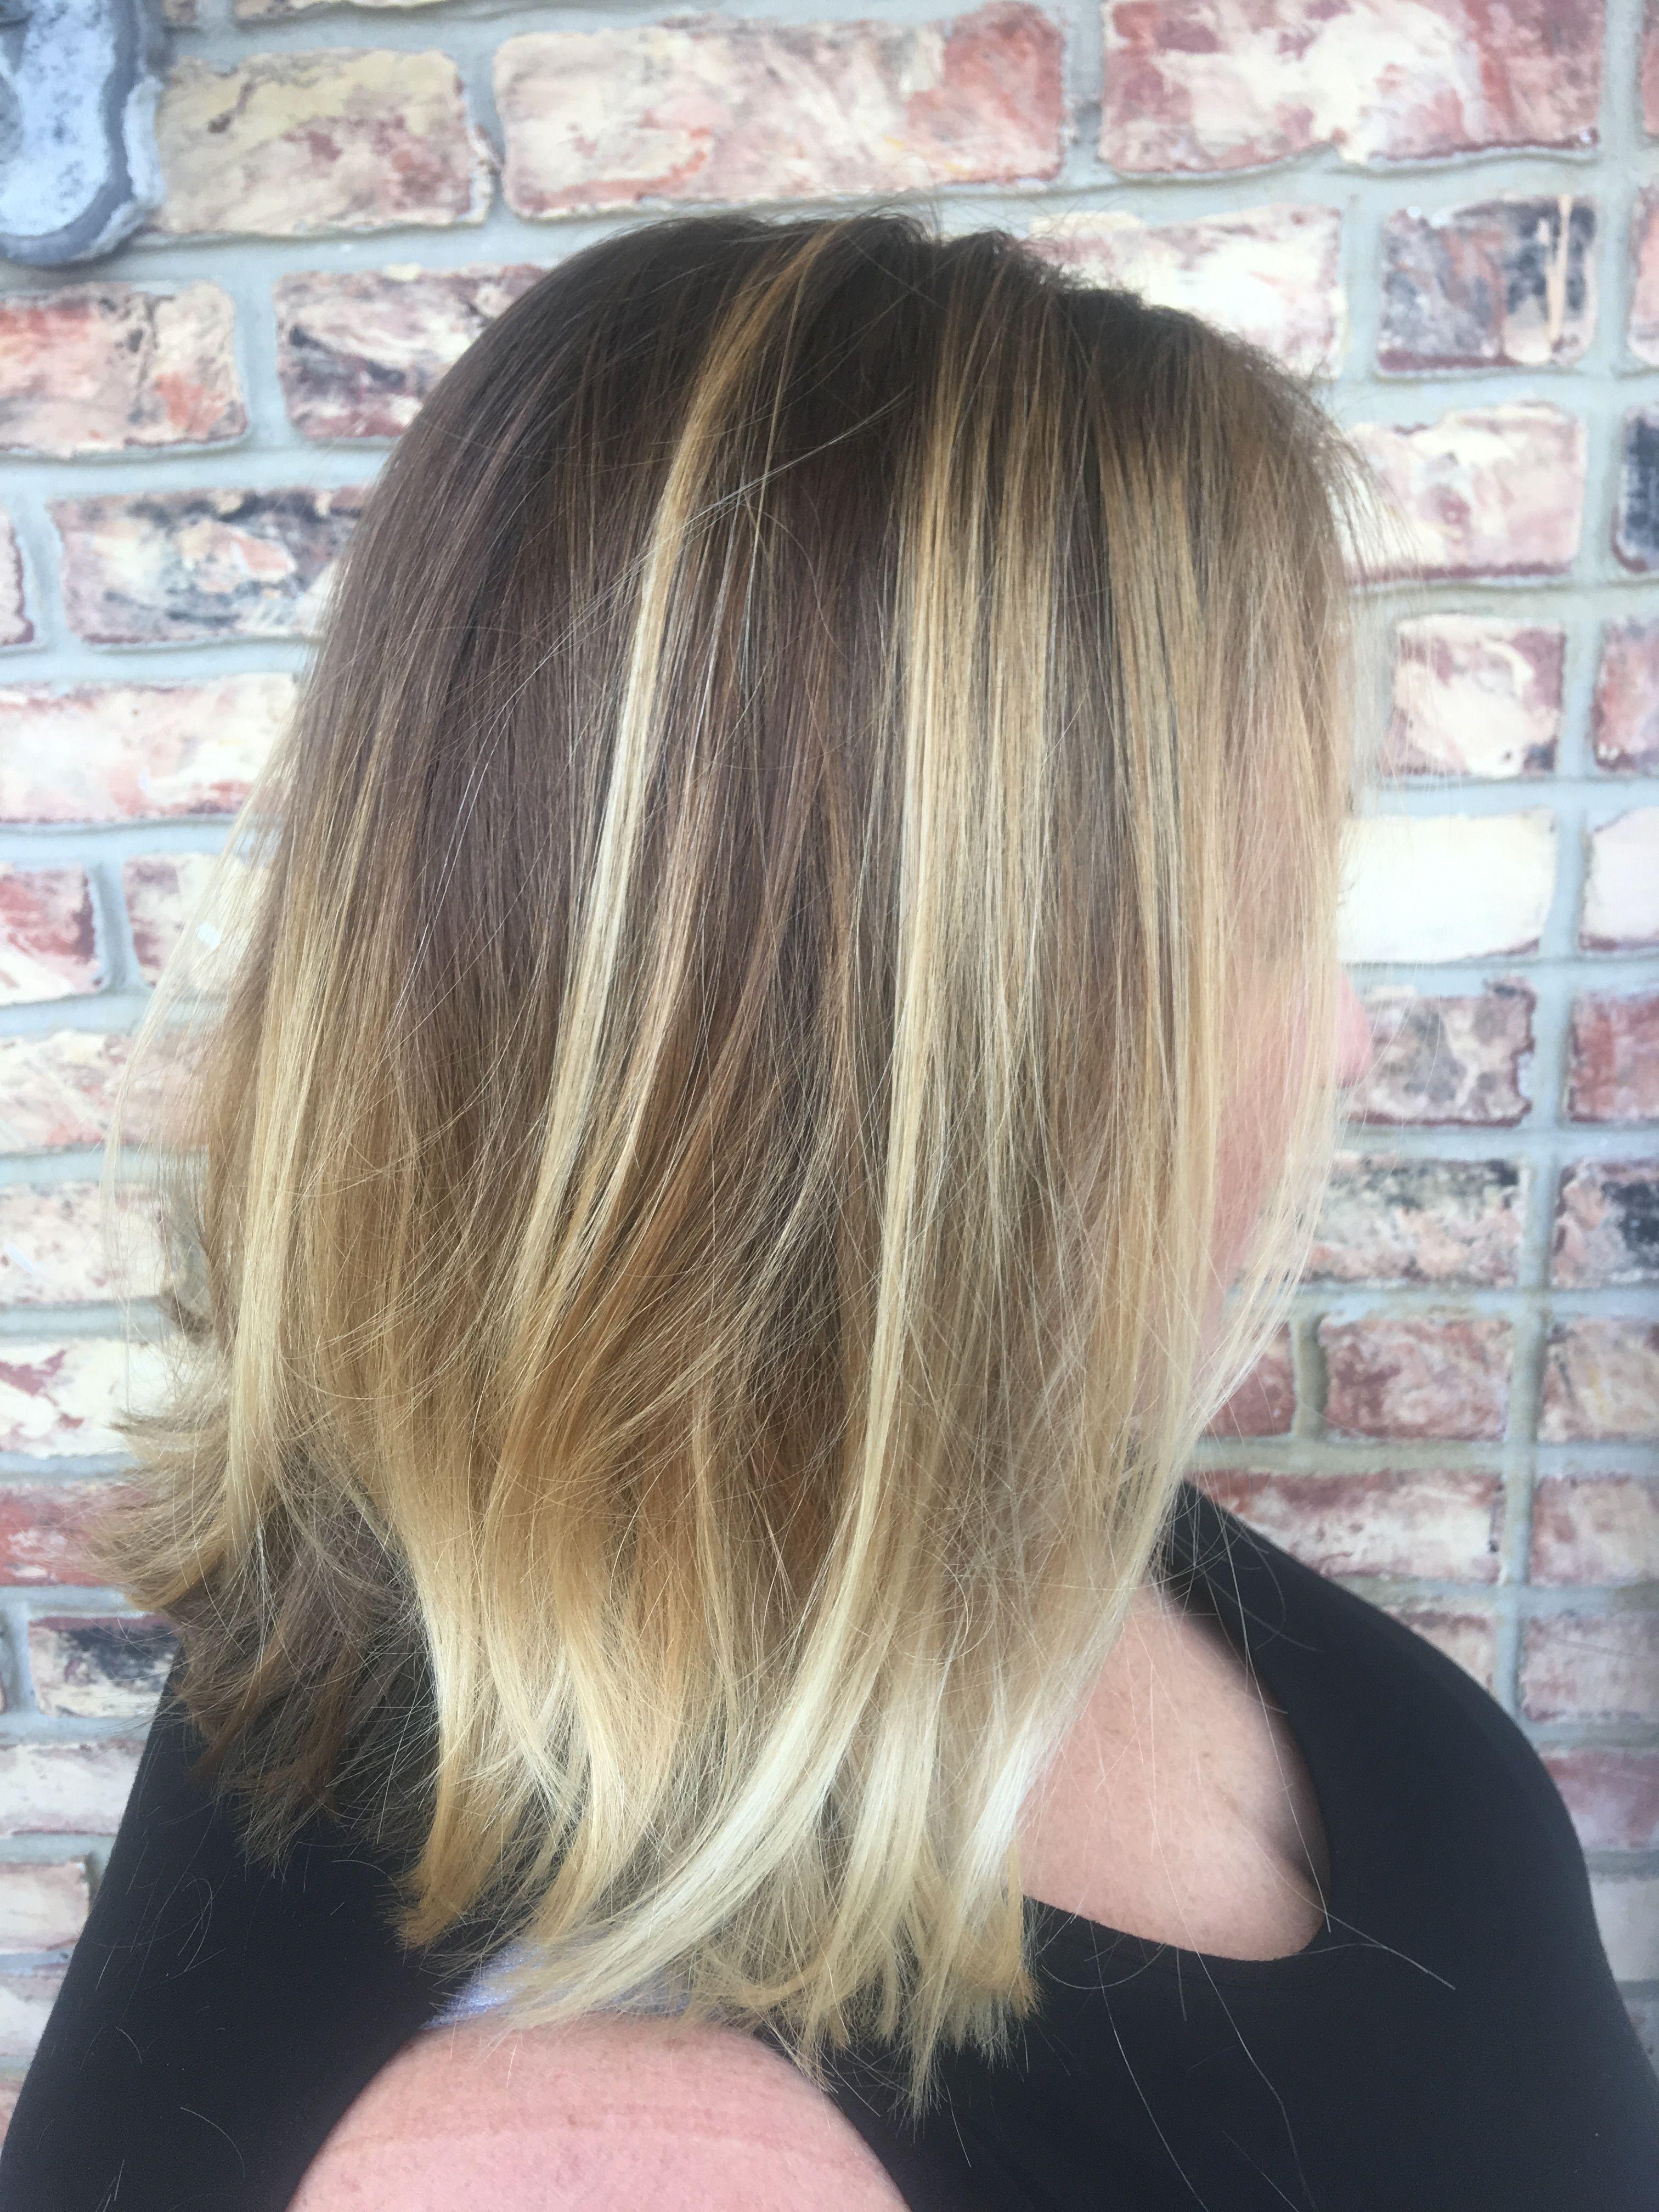 Pin On Hair By Salon Resta Delray In Delray Beach